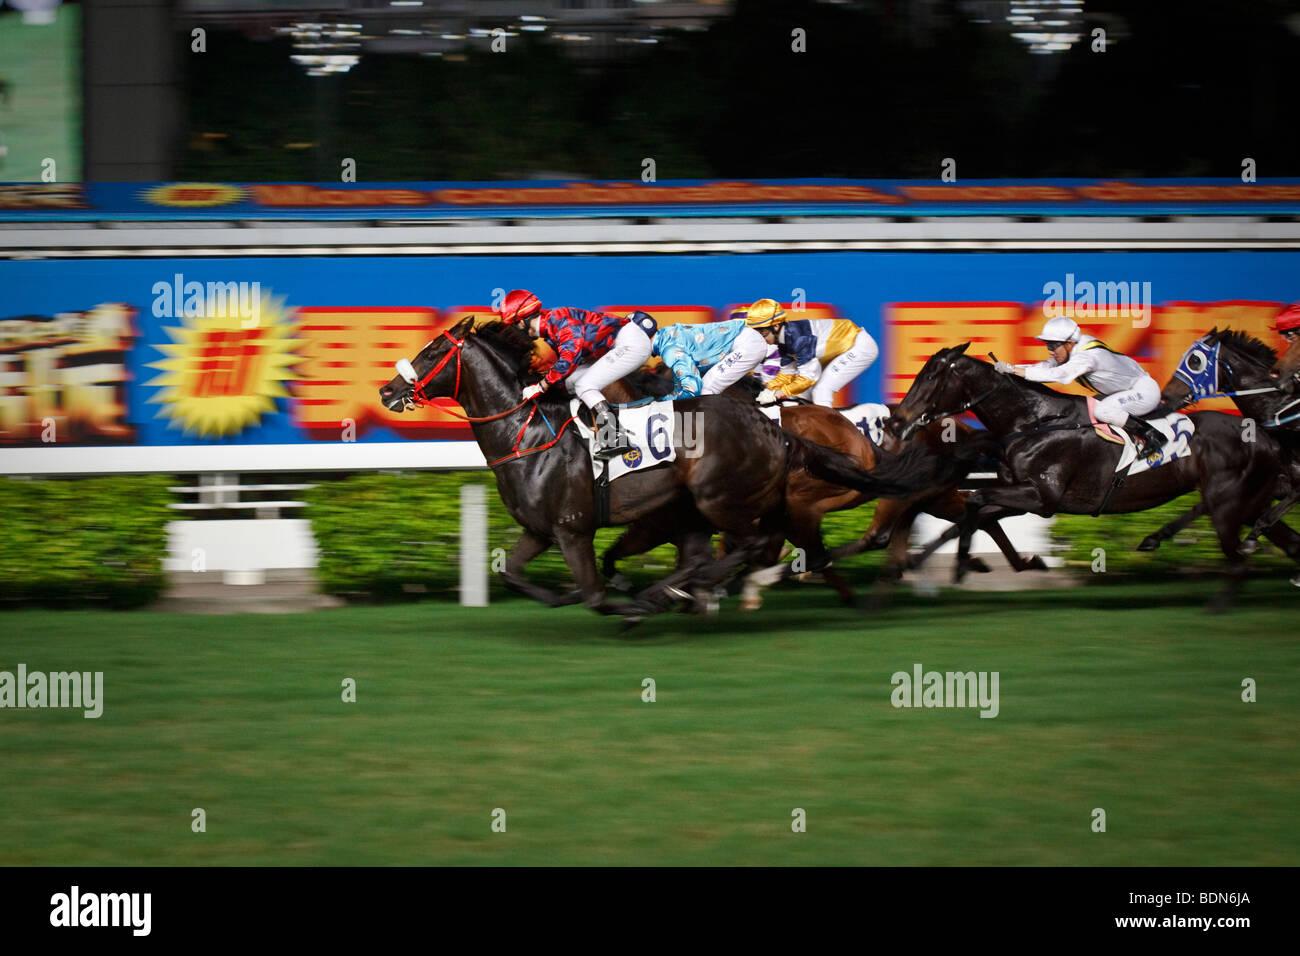 Un galoppo finale alla fine in una notte horse racing event a Happy Valley Race Course a Hong Kong. Immagini Stock